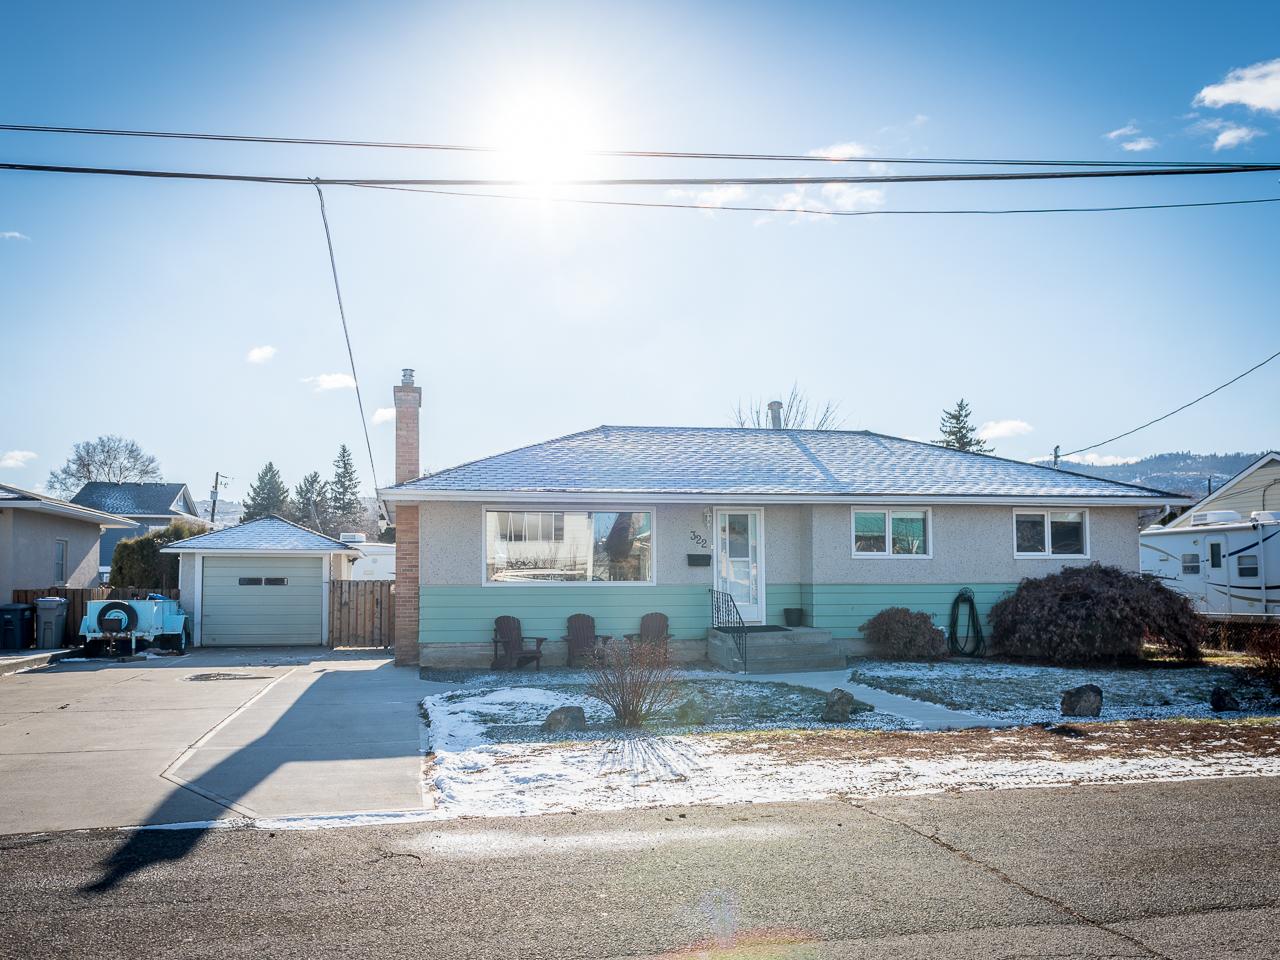 322 Walnut Ave, North Kamloops, Kamloops, BC, Homes For Sale